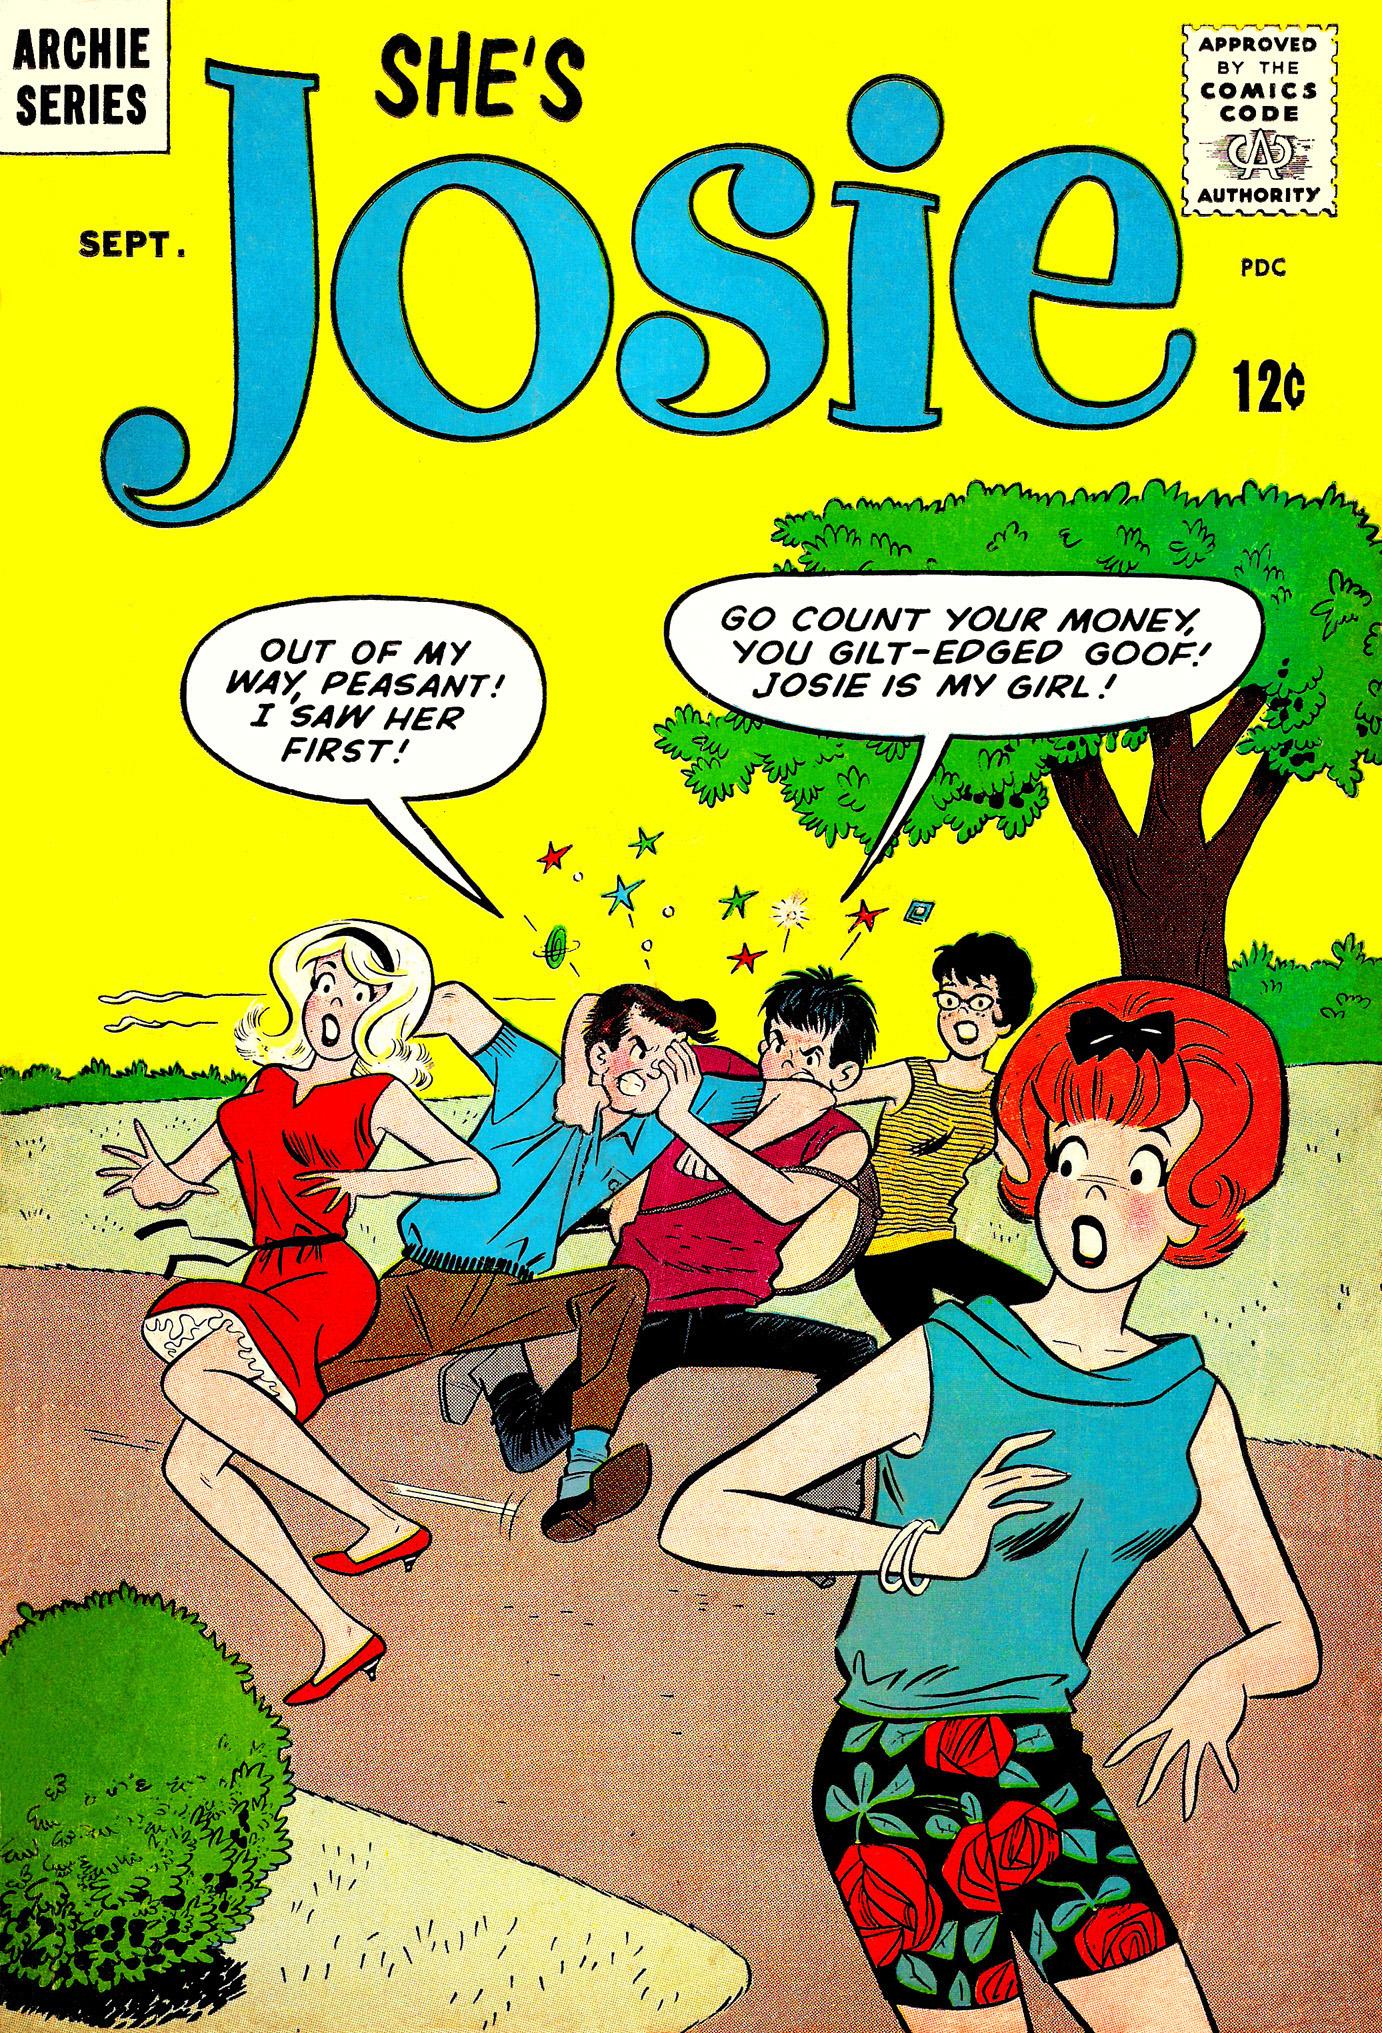 Read online She's Josie comic -  Issue #8 - 1